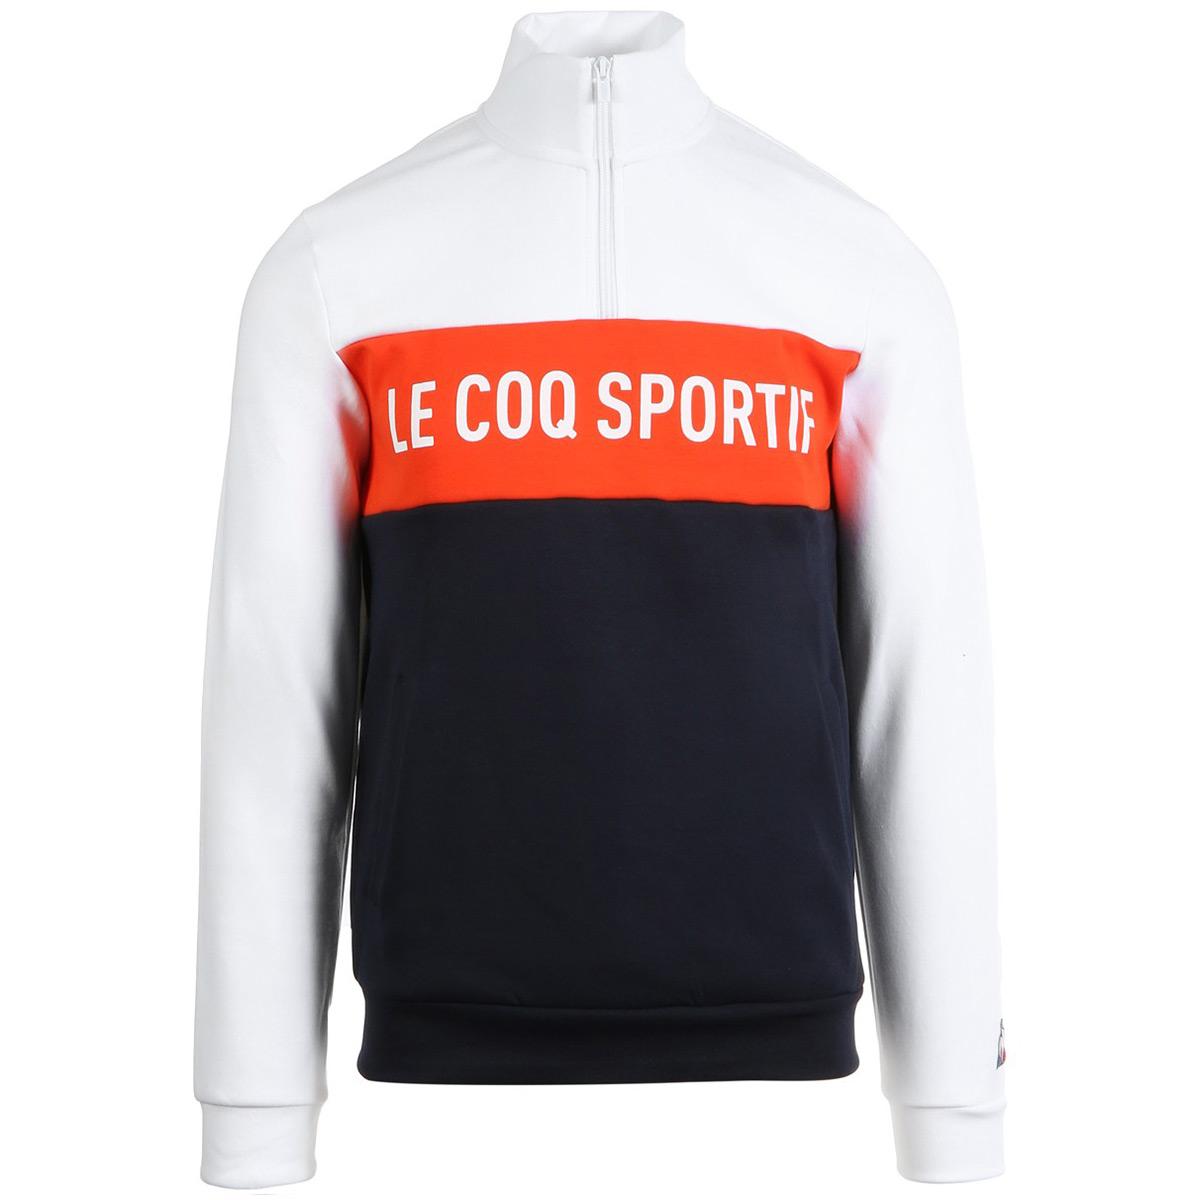 2010431 Zip Essentiels Sweat Sportif 12 Le Saison Coq 6gvYbf7y